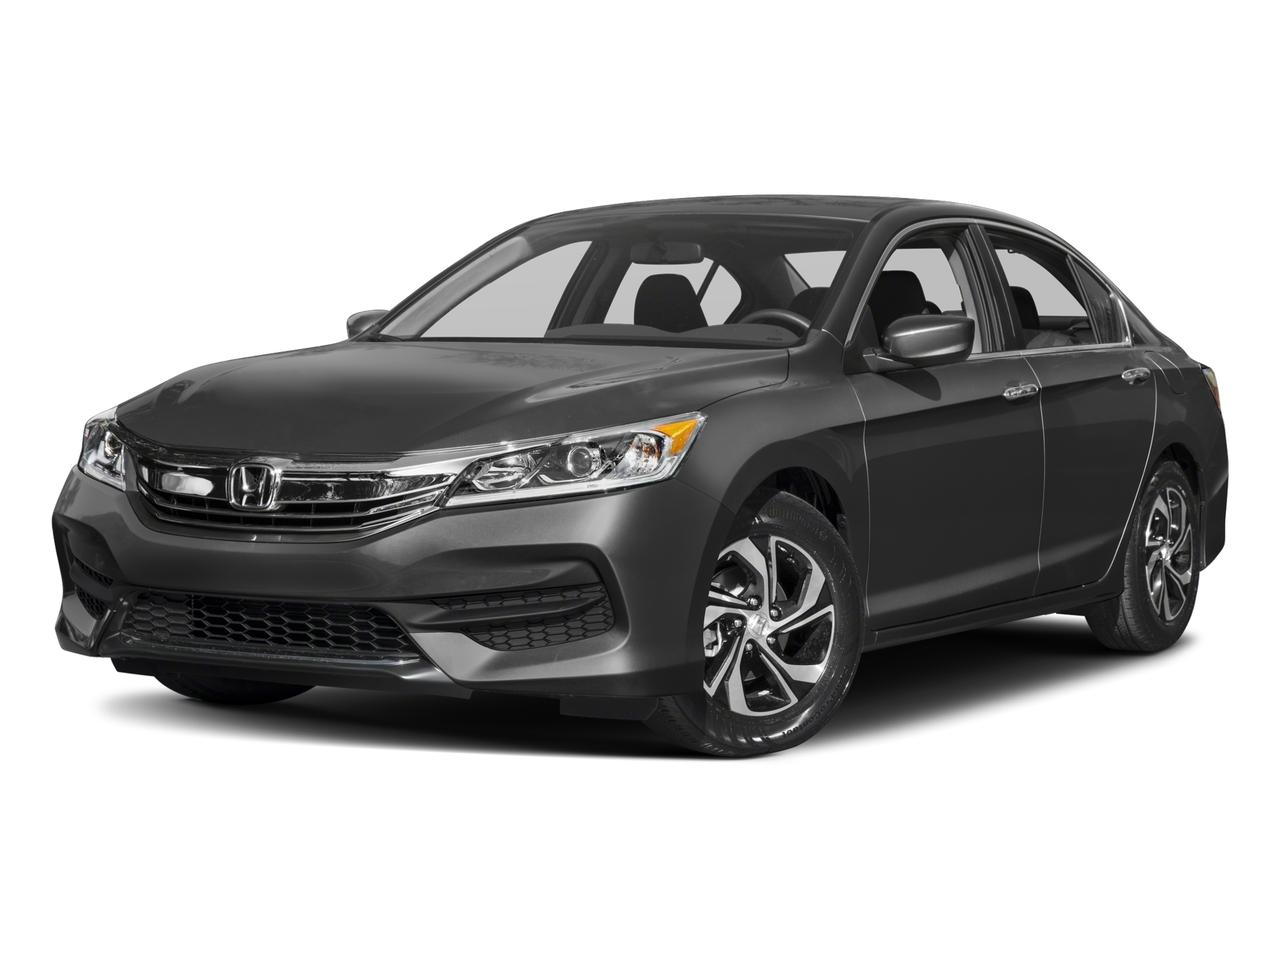 2017 Honda Accord Sedan Vehicle Photo in Austin, TX 78759